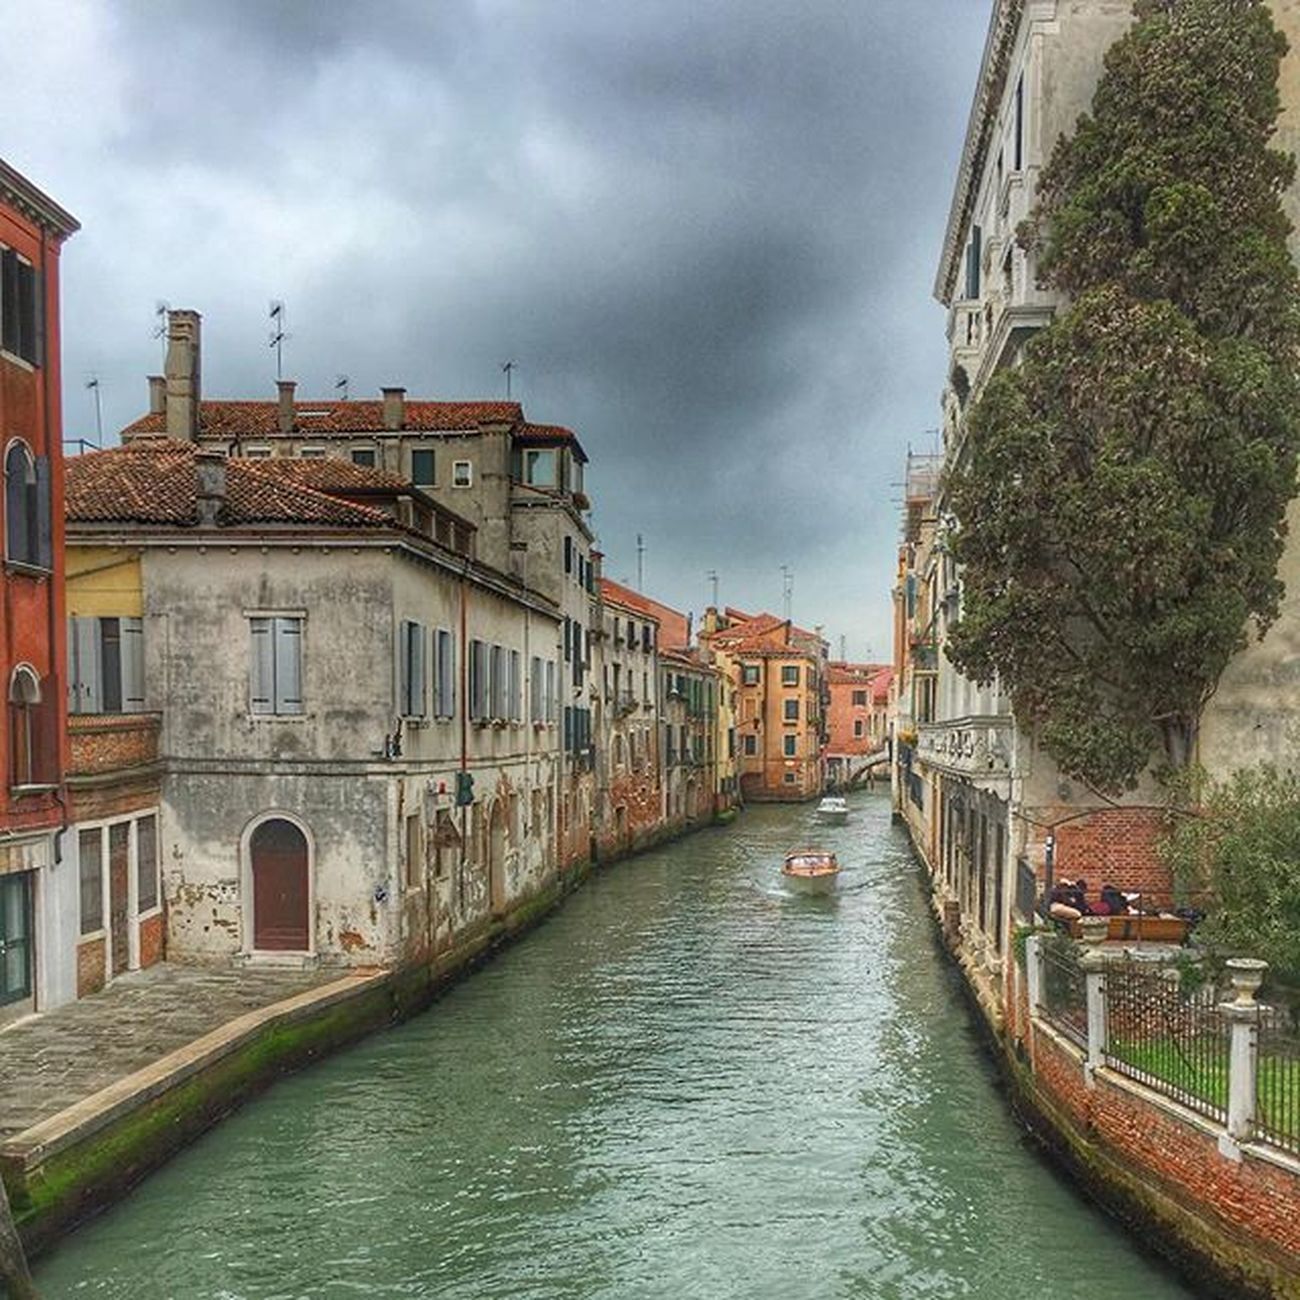 Venezia Istanday Istatime Instagram Instalife Instalike Istancoll Italystyle Italy Time Picoftheday Lyfetime Lifestyle Follow Followme Tag